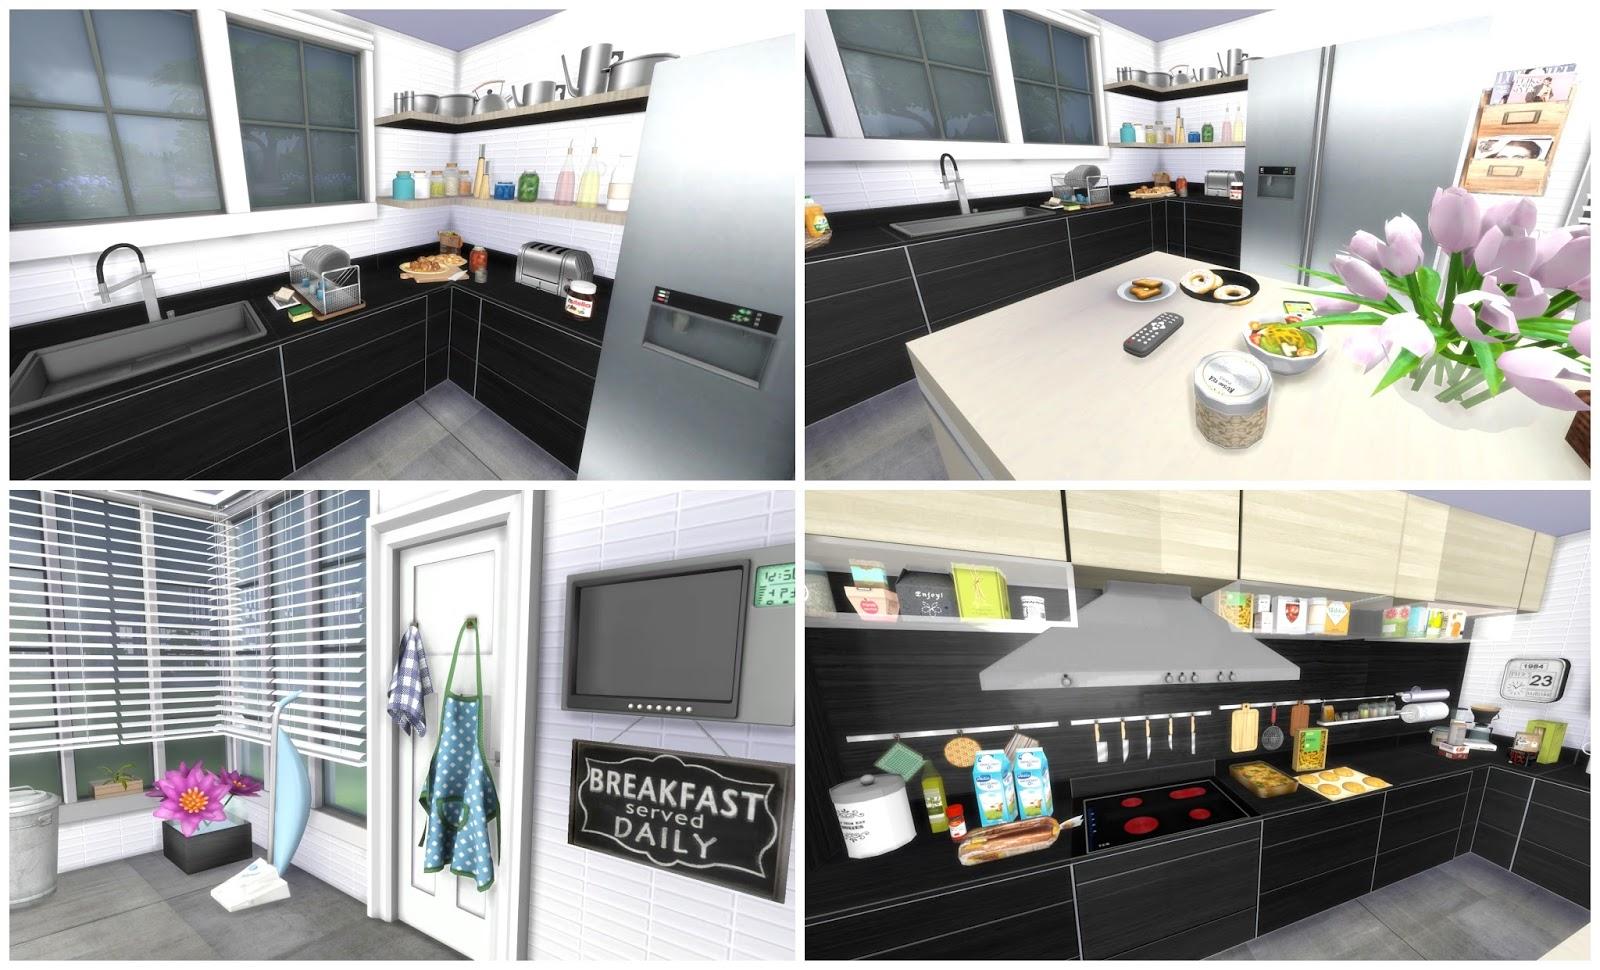 Sims 4 modern kitchen dinha for Modern kitchen sims 3